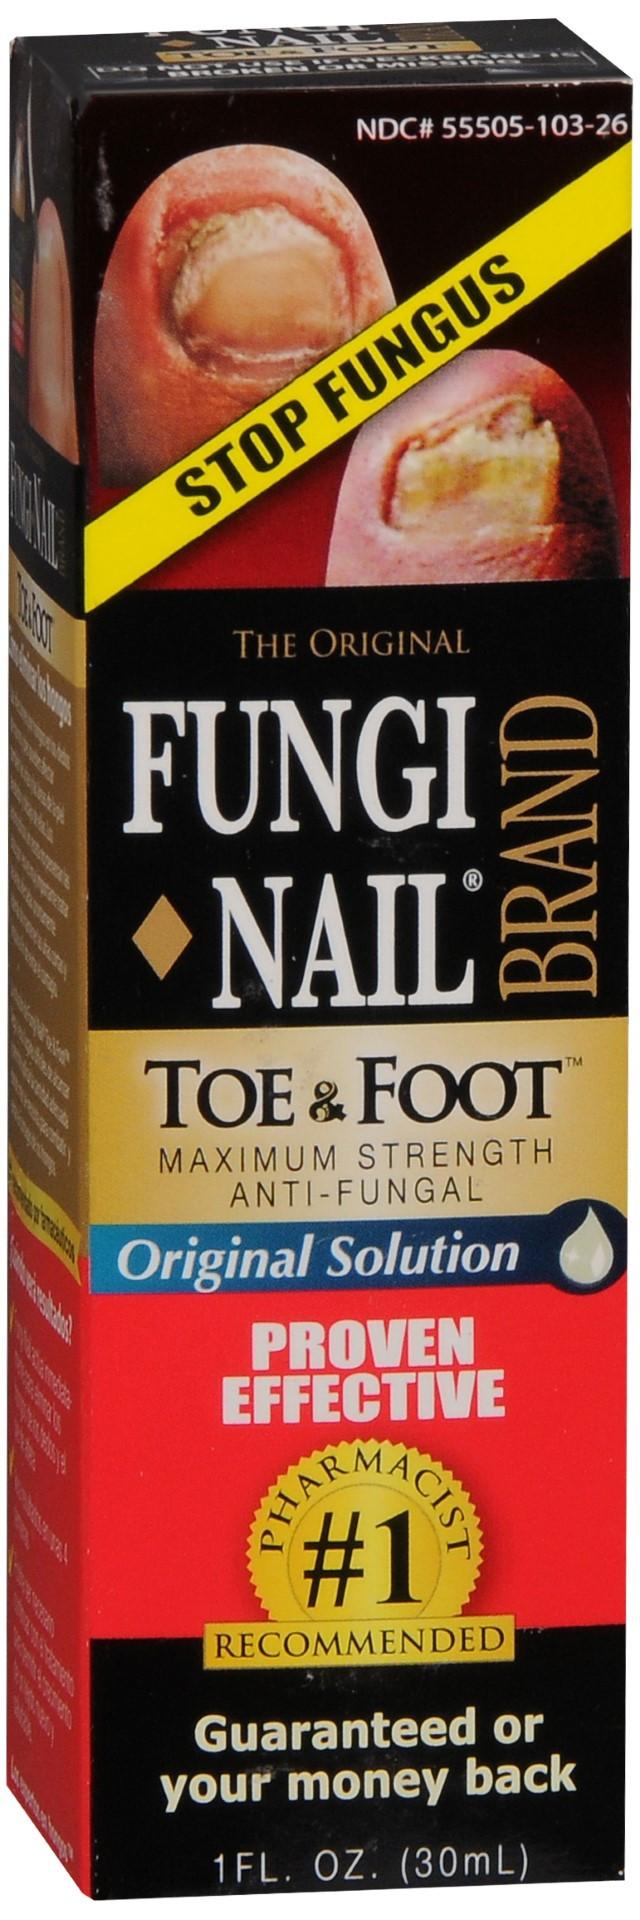 Fungi-Nail Toe & Foot Original Solution | Asti\'s South Hills Pharmacy